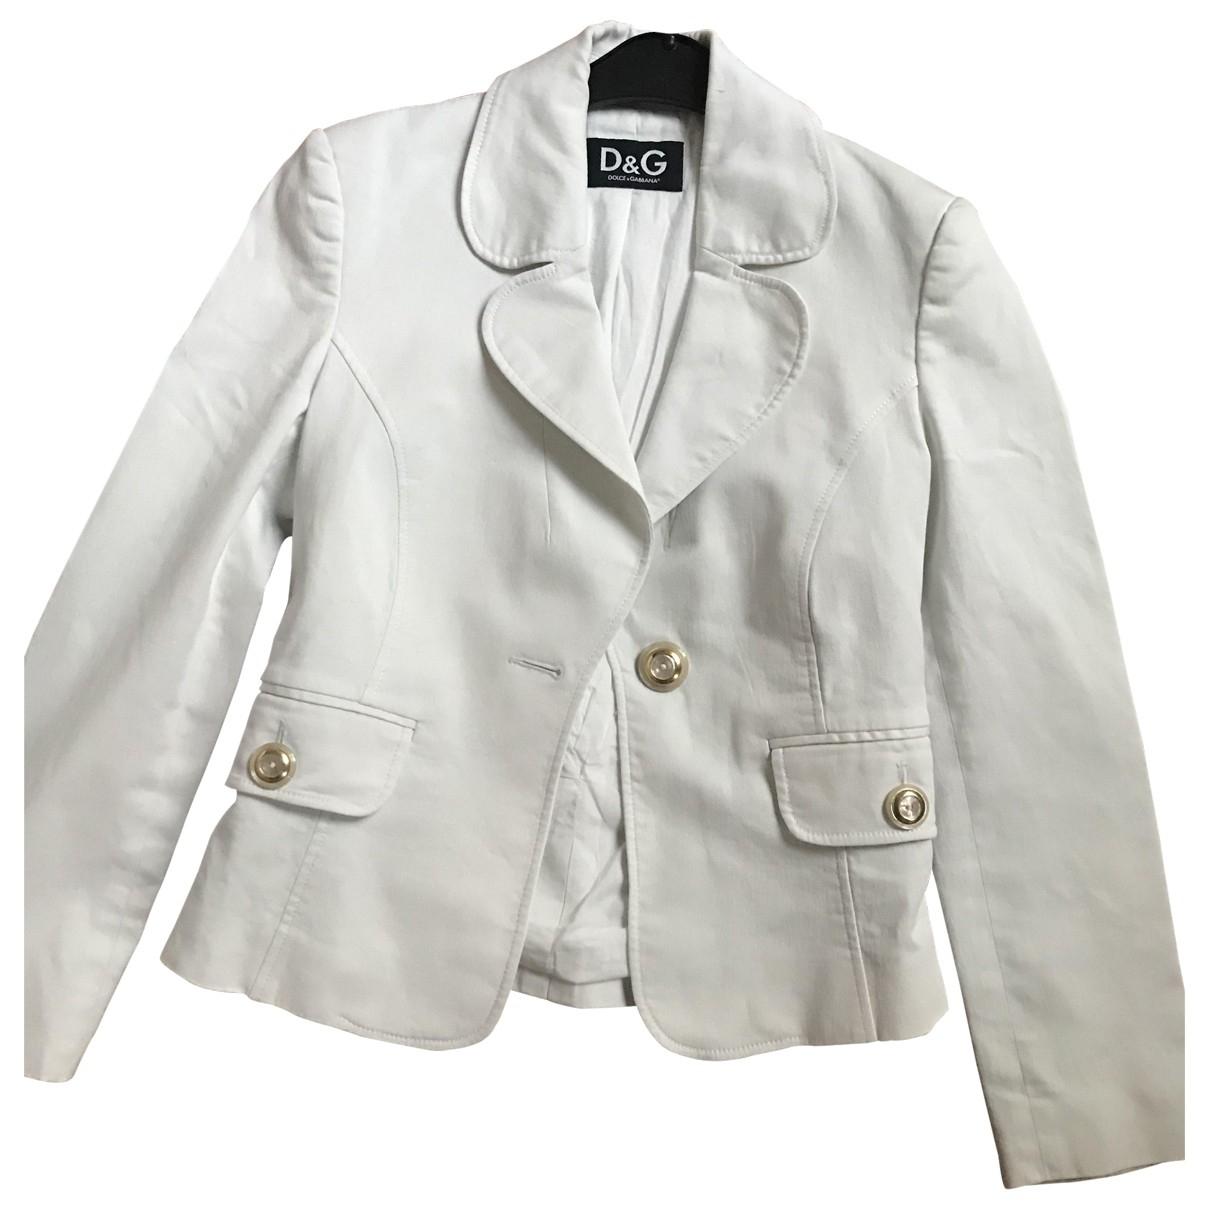 D&g \N White Cotton jacket for Women 38 IT